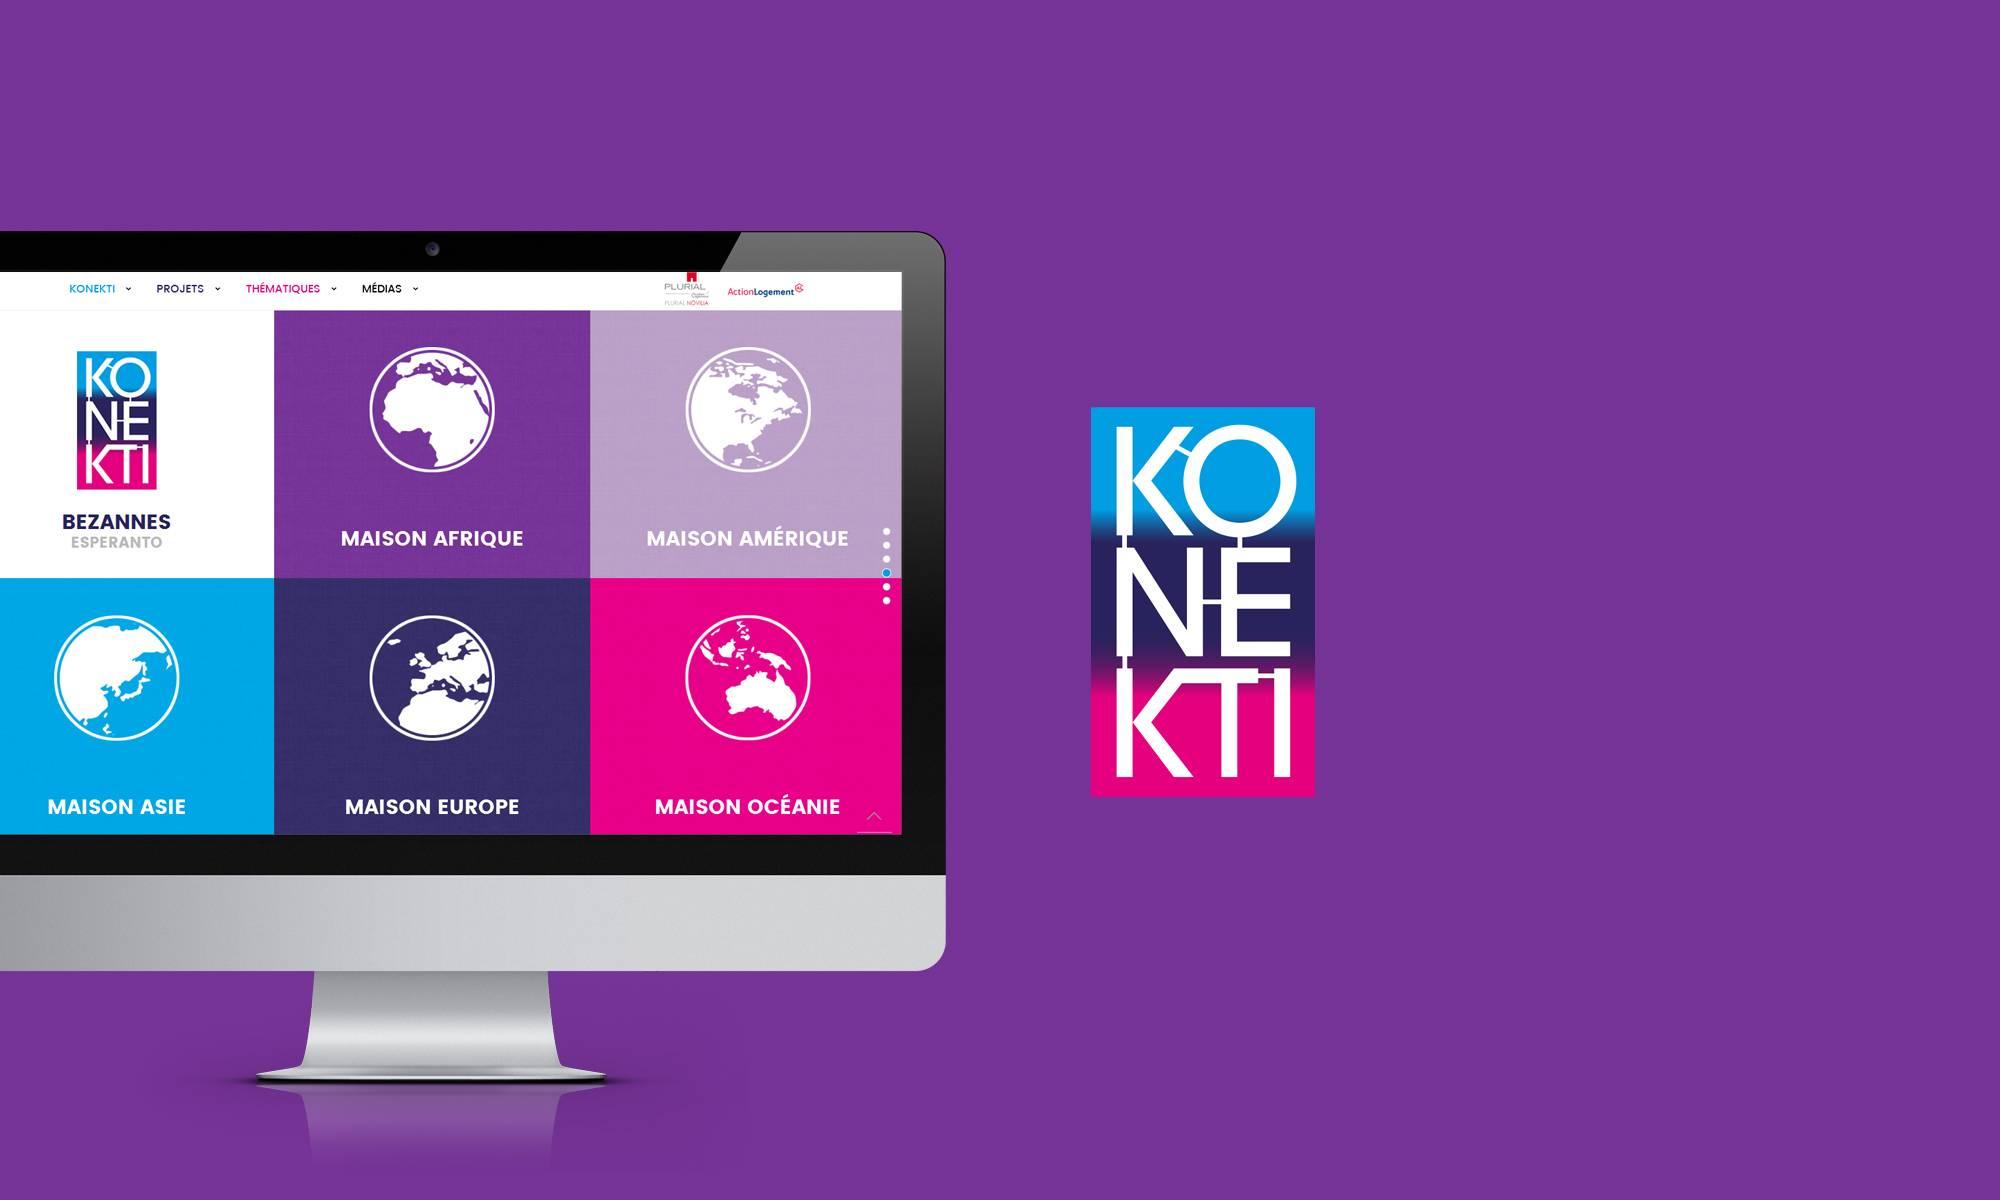 Studio NEKO - Konekti - Screen 3